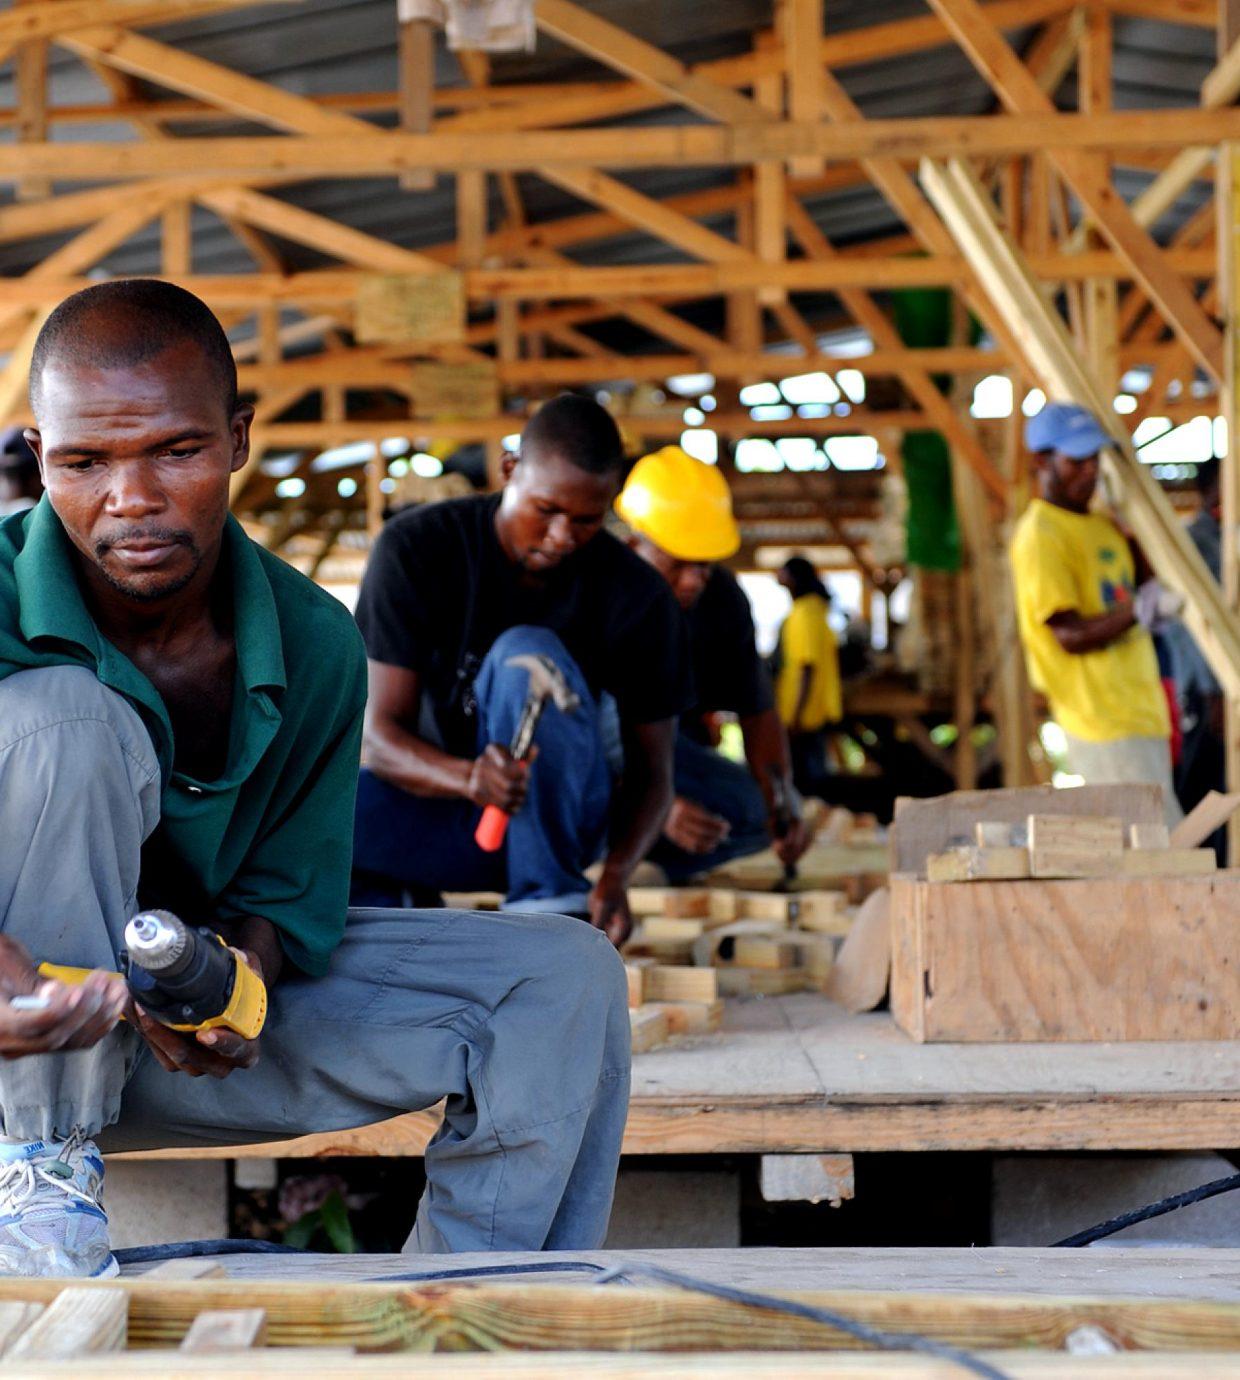 Preparing shelter materials workers prepare materials for transi